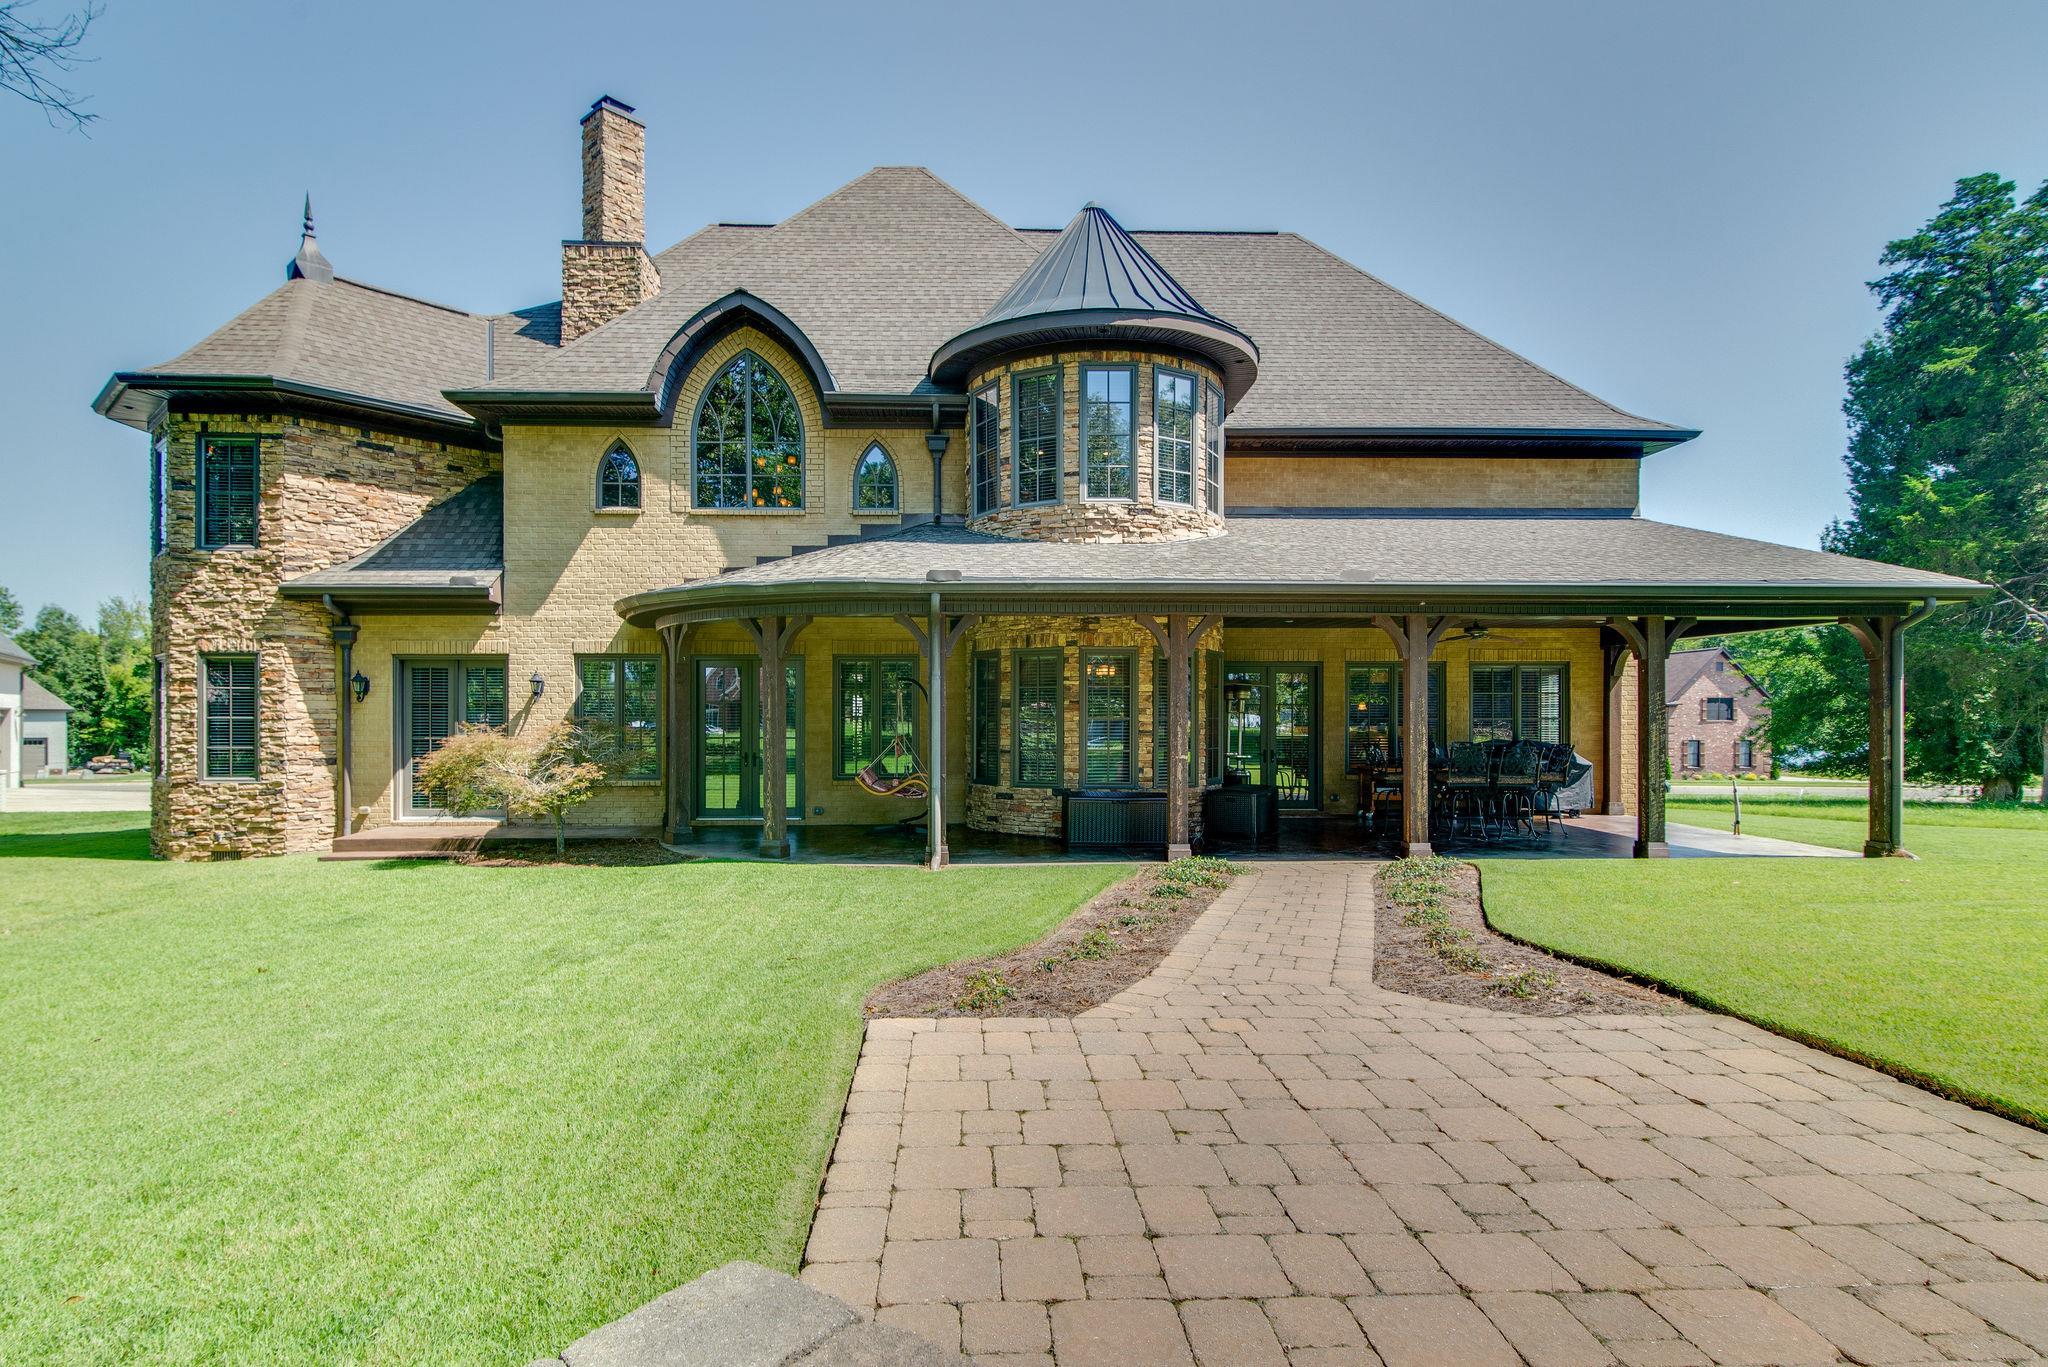 206 Camille Victoria Ct, Mount Juliet, TN 37122 - Mount Juliet, TN real estate listing